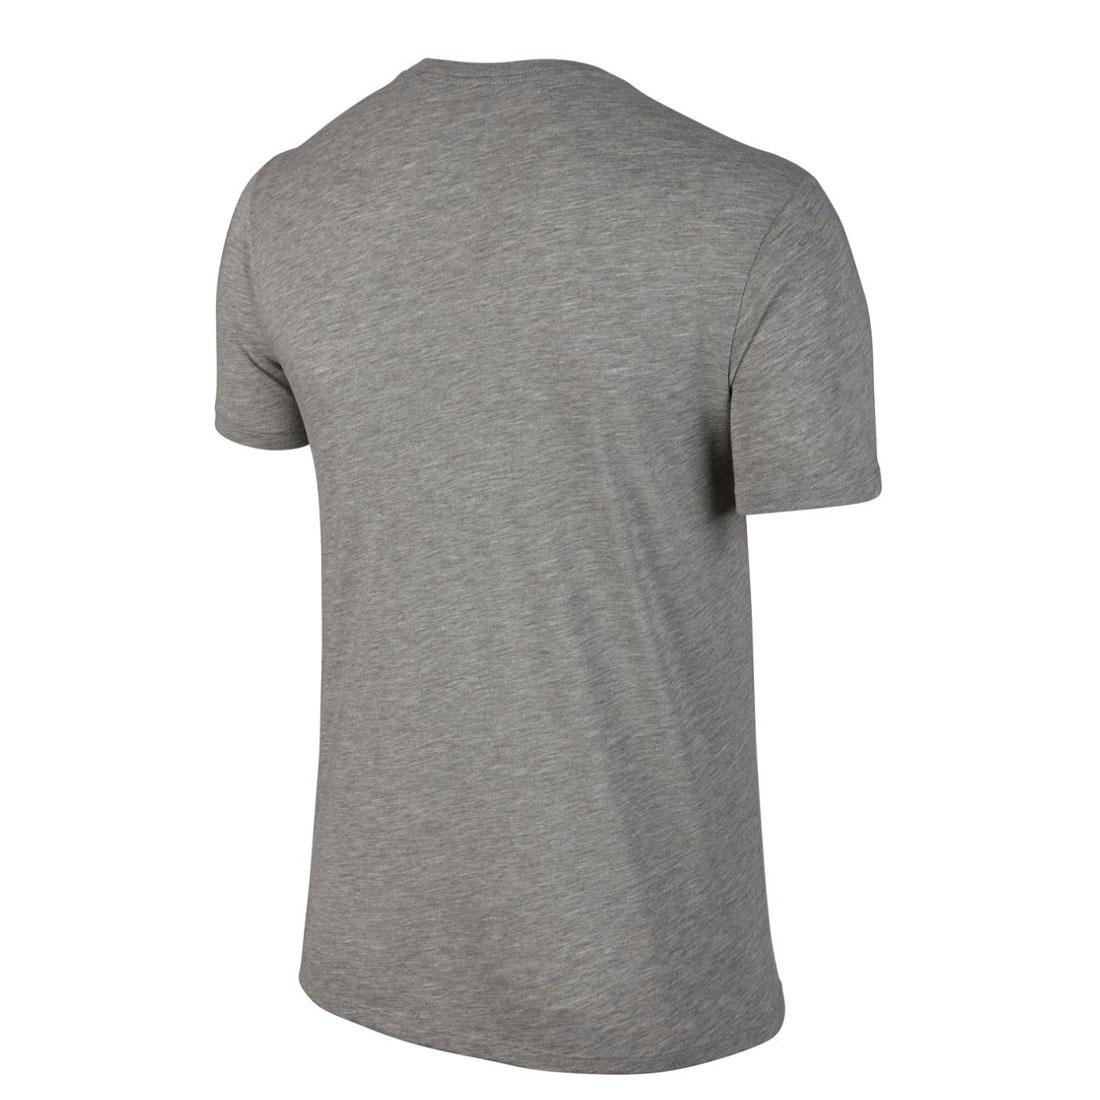 Nike Swoosh Mens Classic Gym T Shirt Cotton Crew Neck White Grey Sports Tee